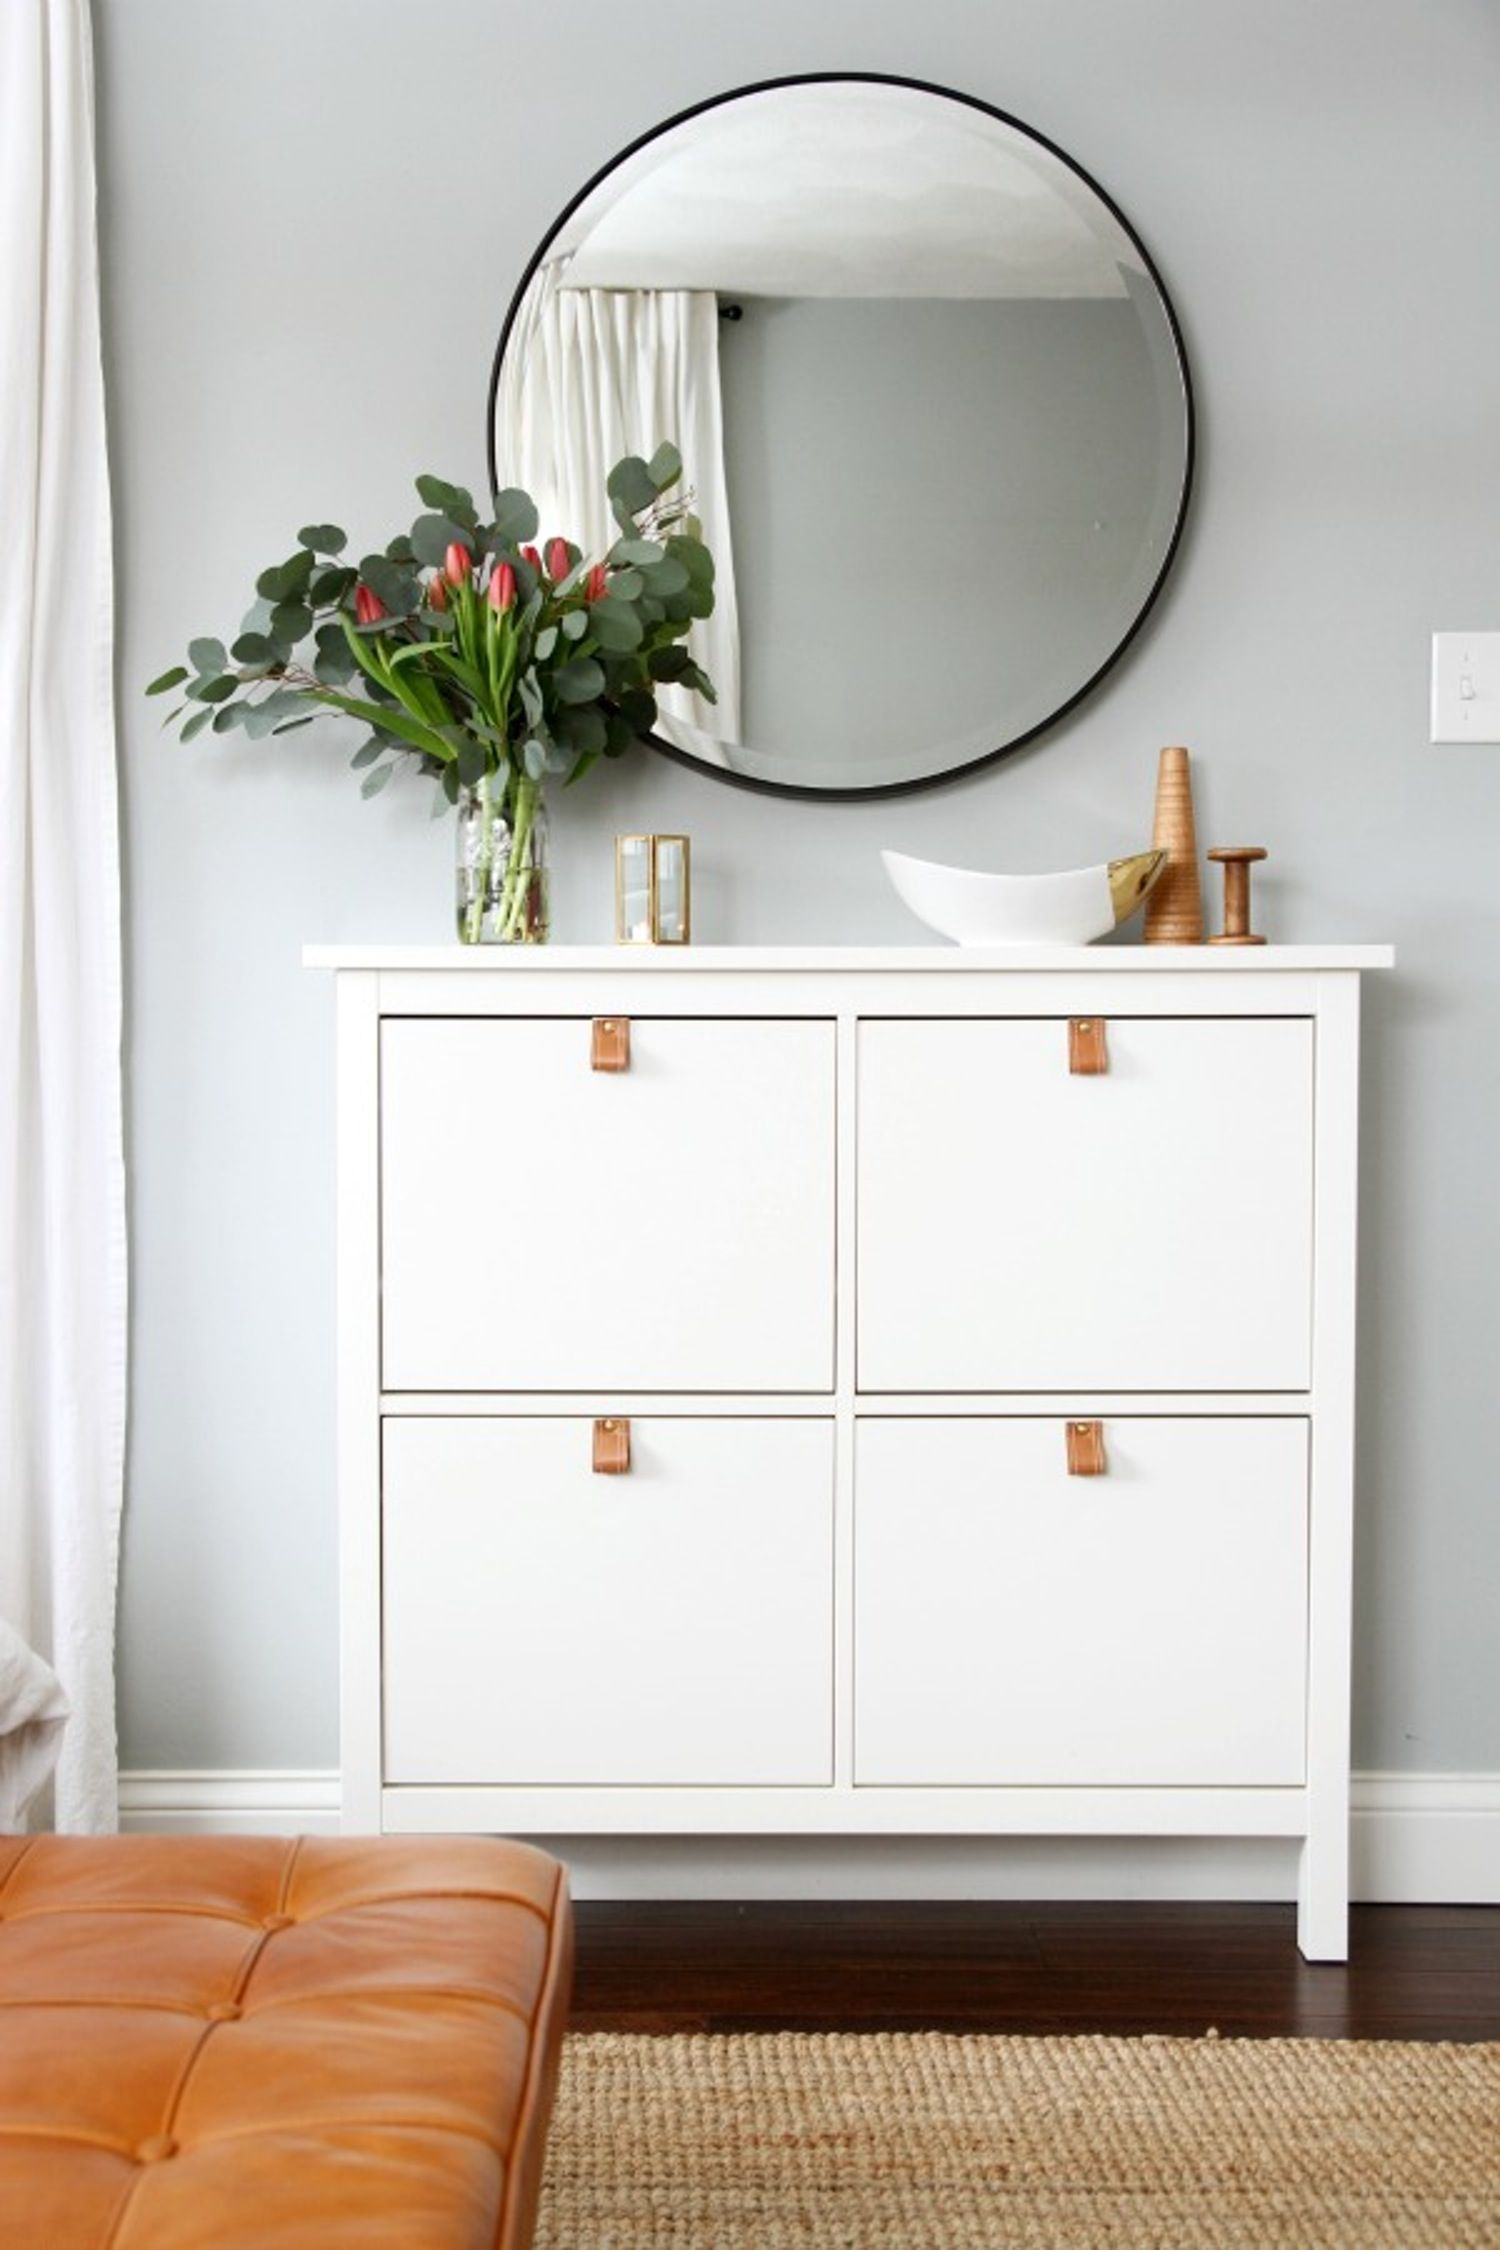 Small hallway furniture  Big Impact Small Effort Easy Upgrades for IKEA Furniture  Big